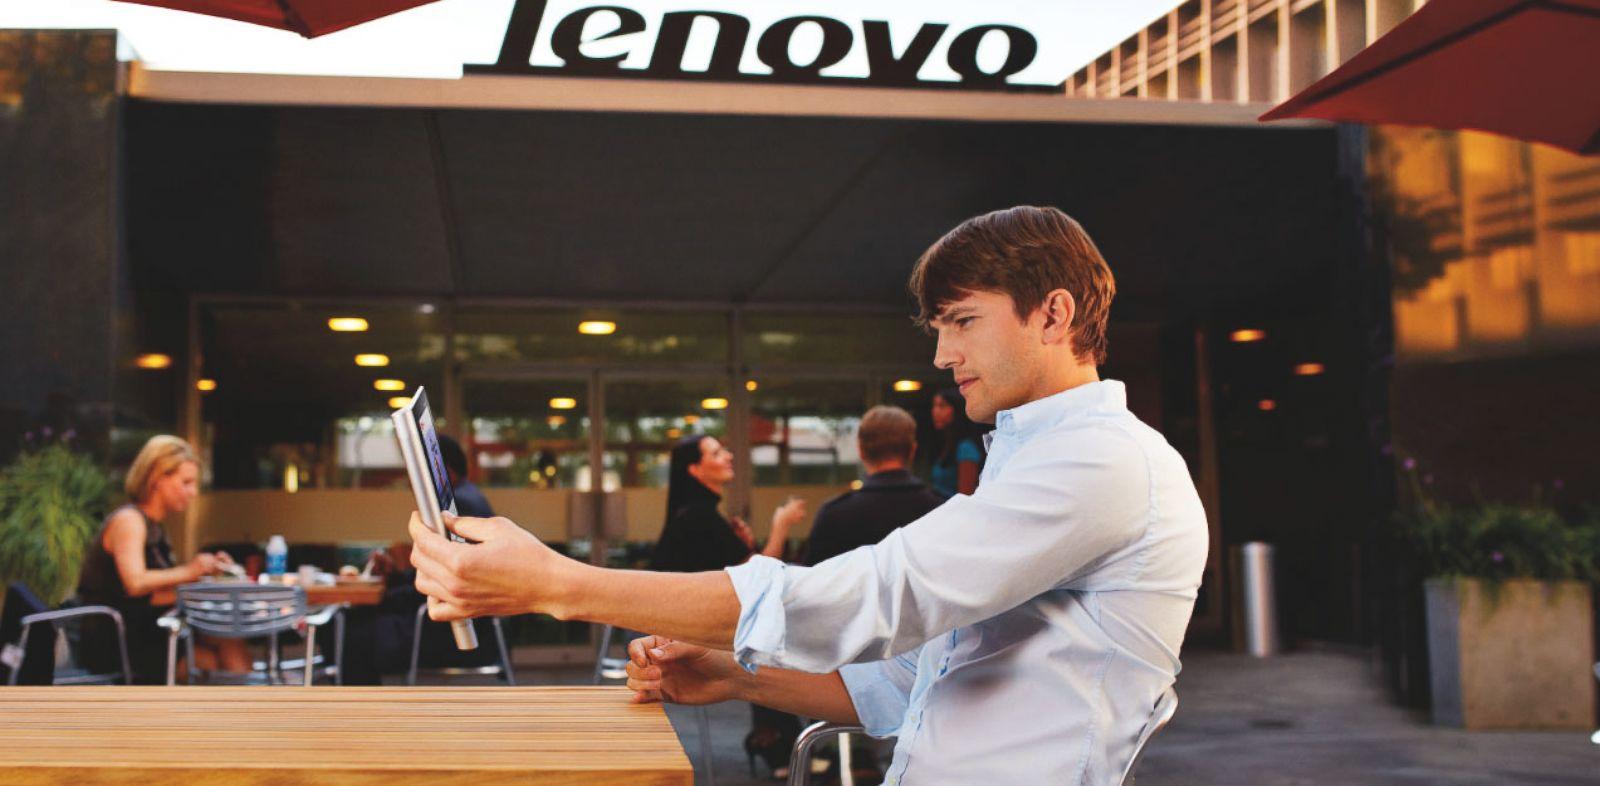 PHOTO: Ashton Kutcher is now a Lenovo product engineer.